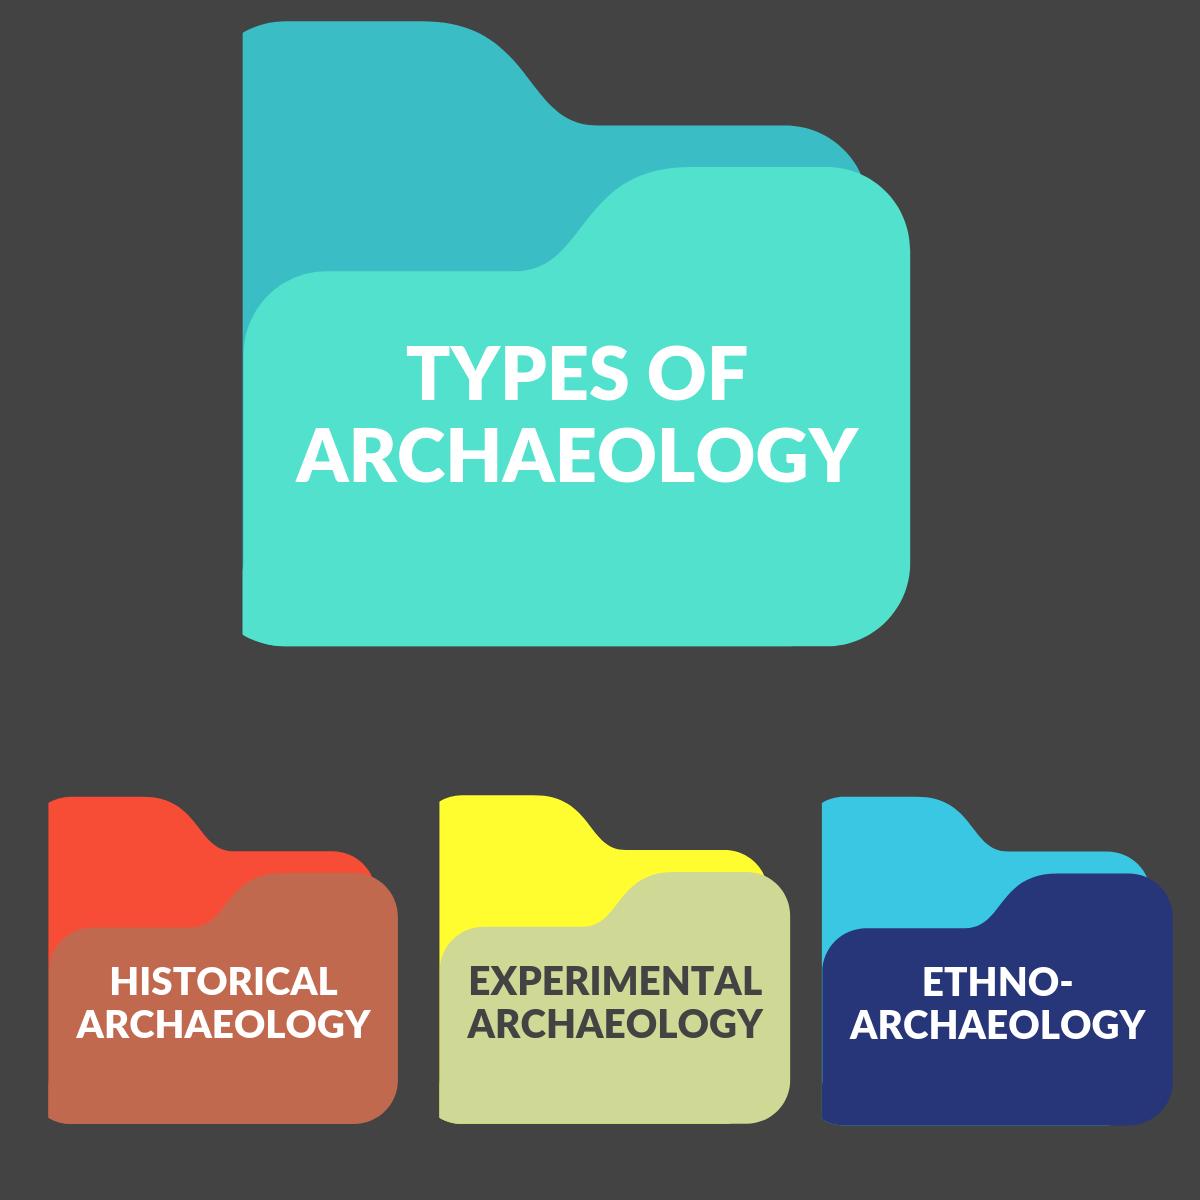 alternateforarchaeology